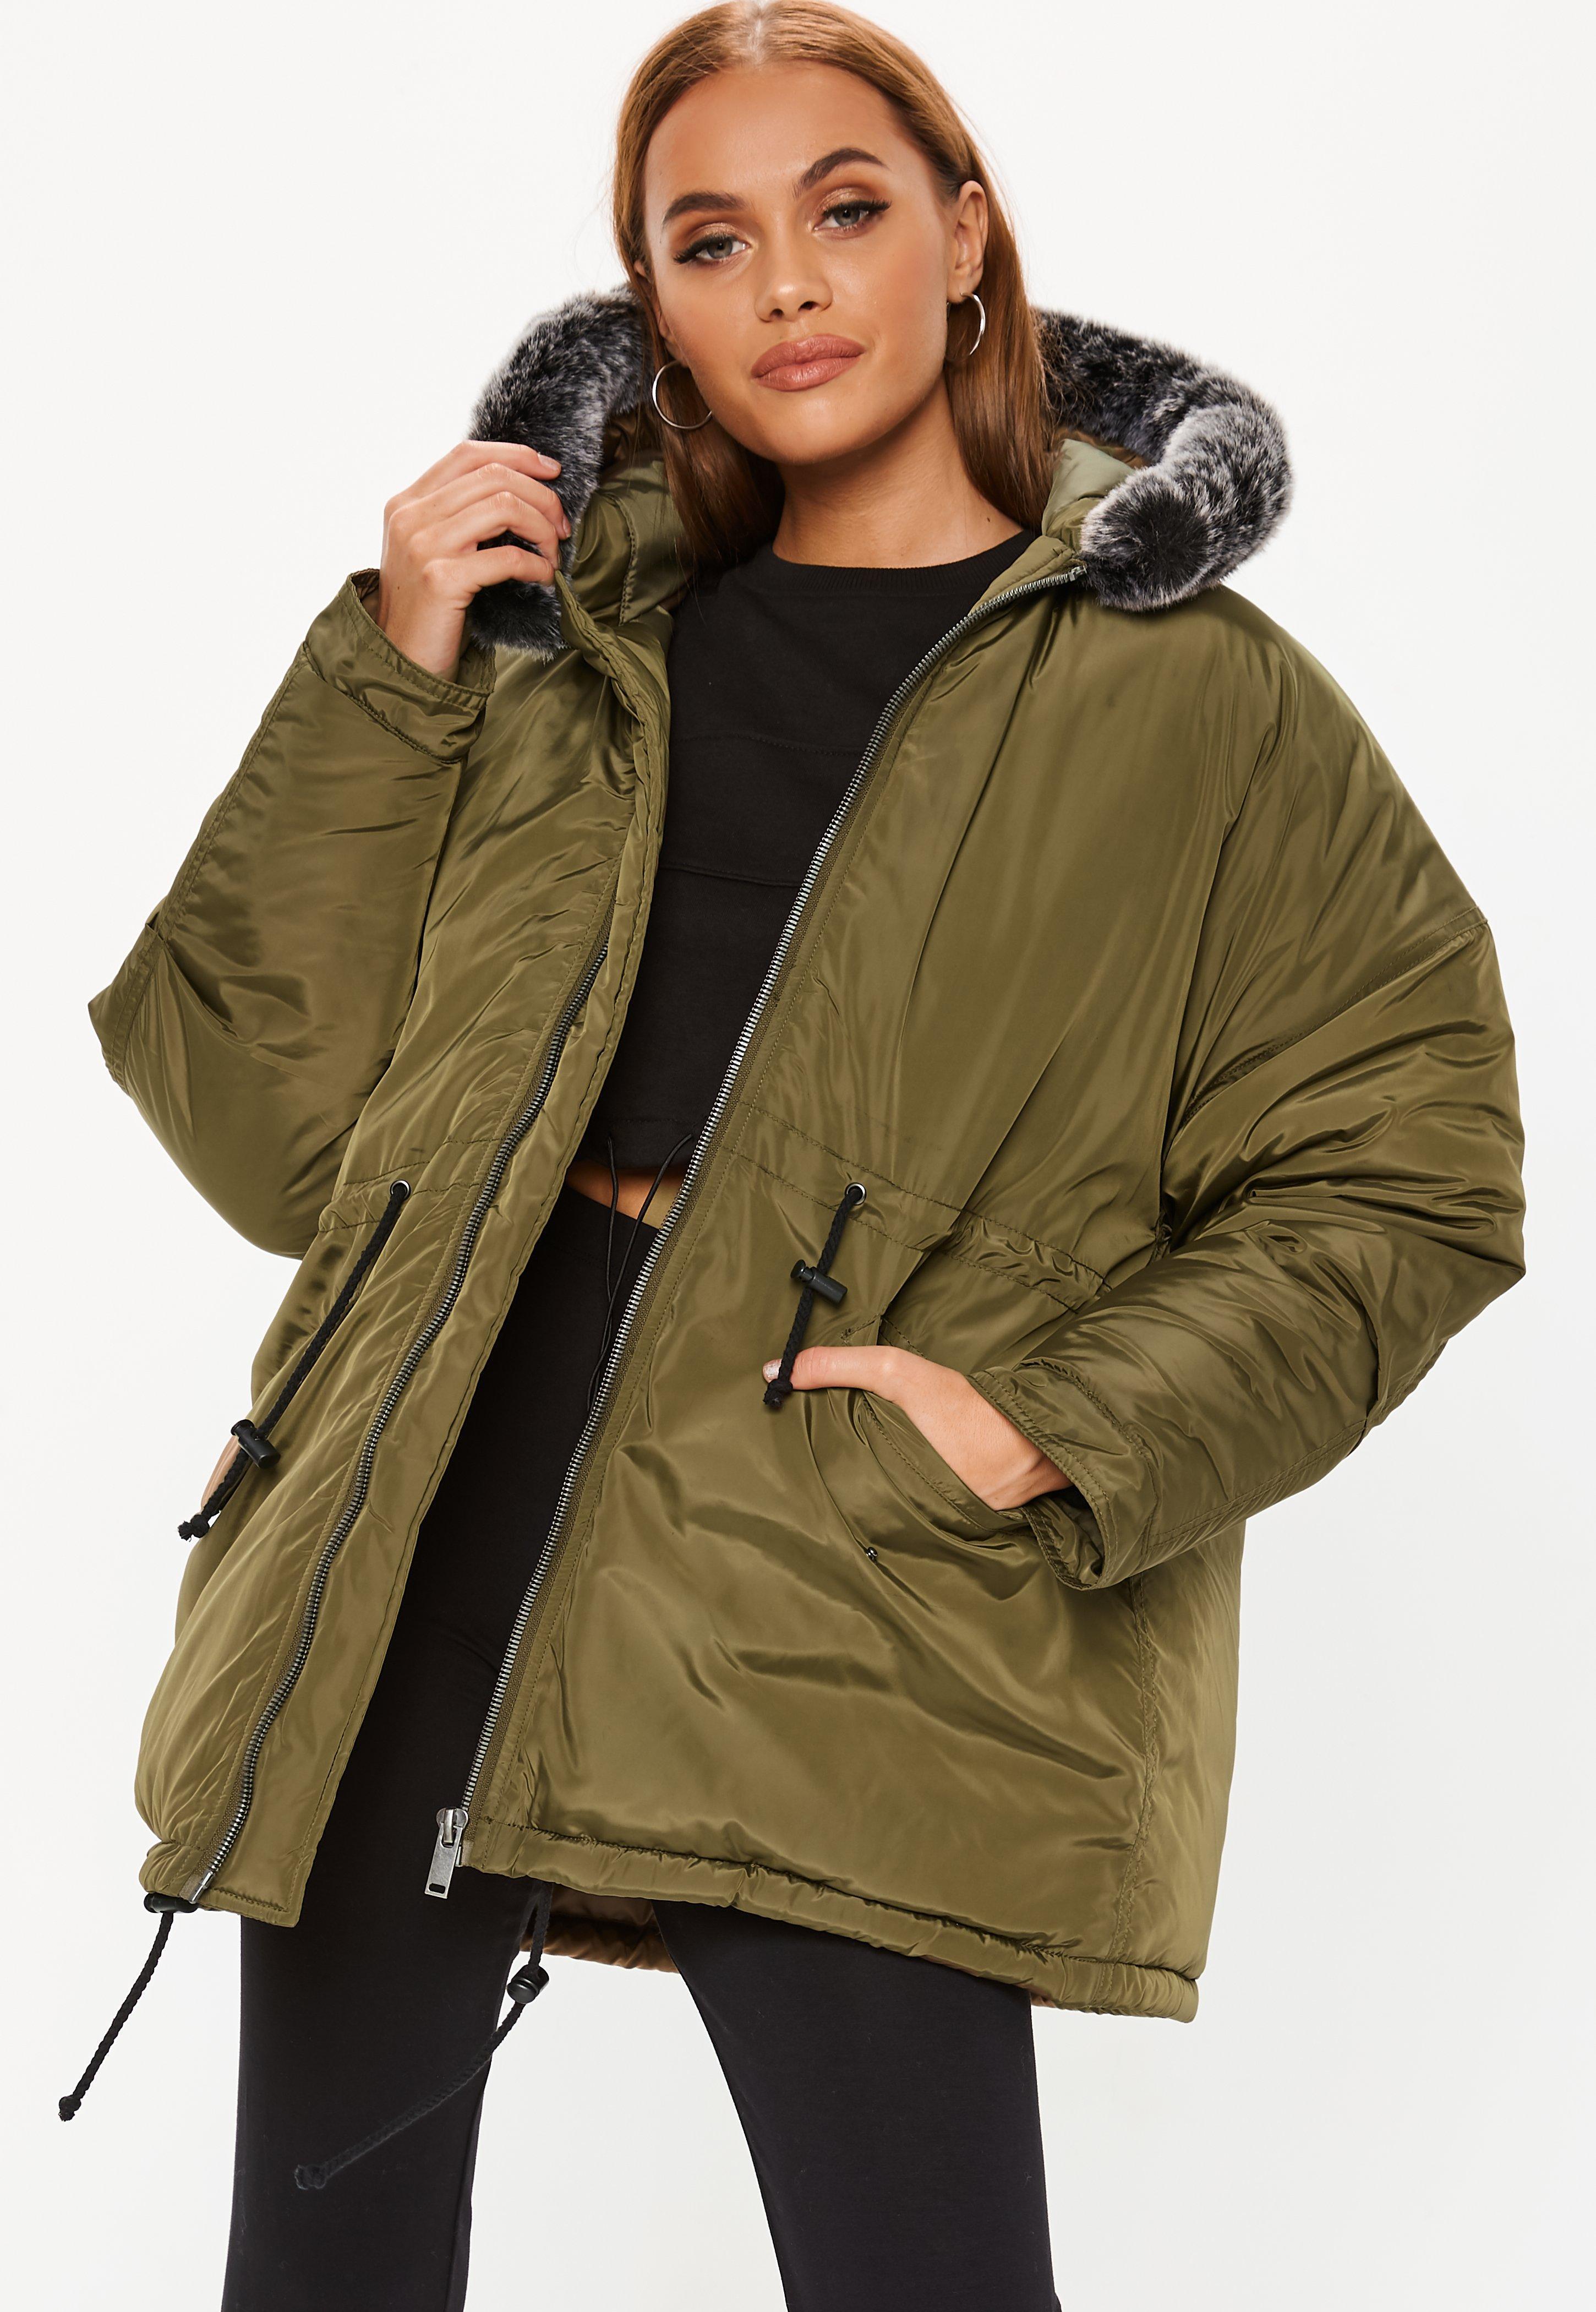 b193420dfbfab Missguided. Women s Natural Khaki Contrast Faux Fur Trim Utility Parka  Jacket